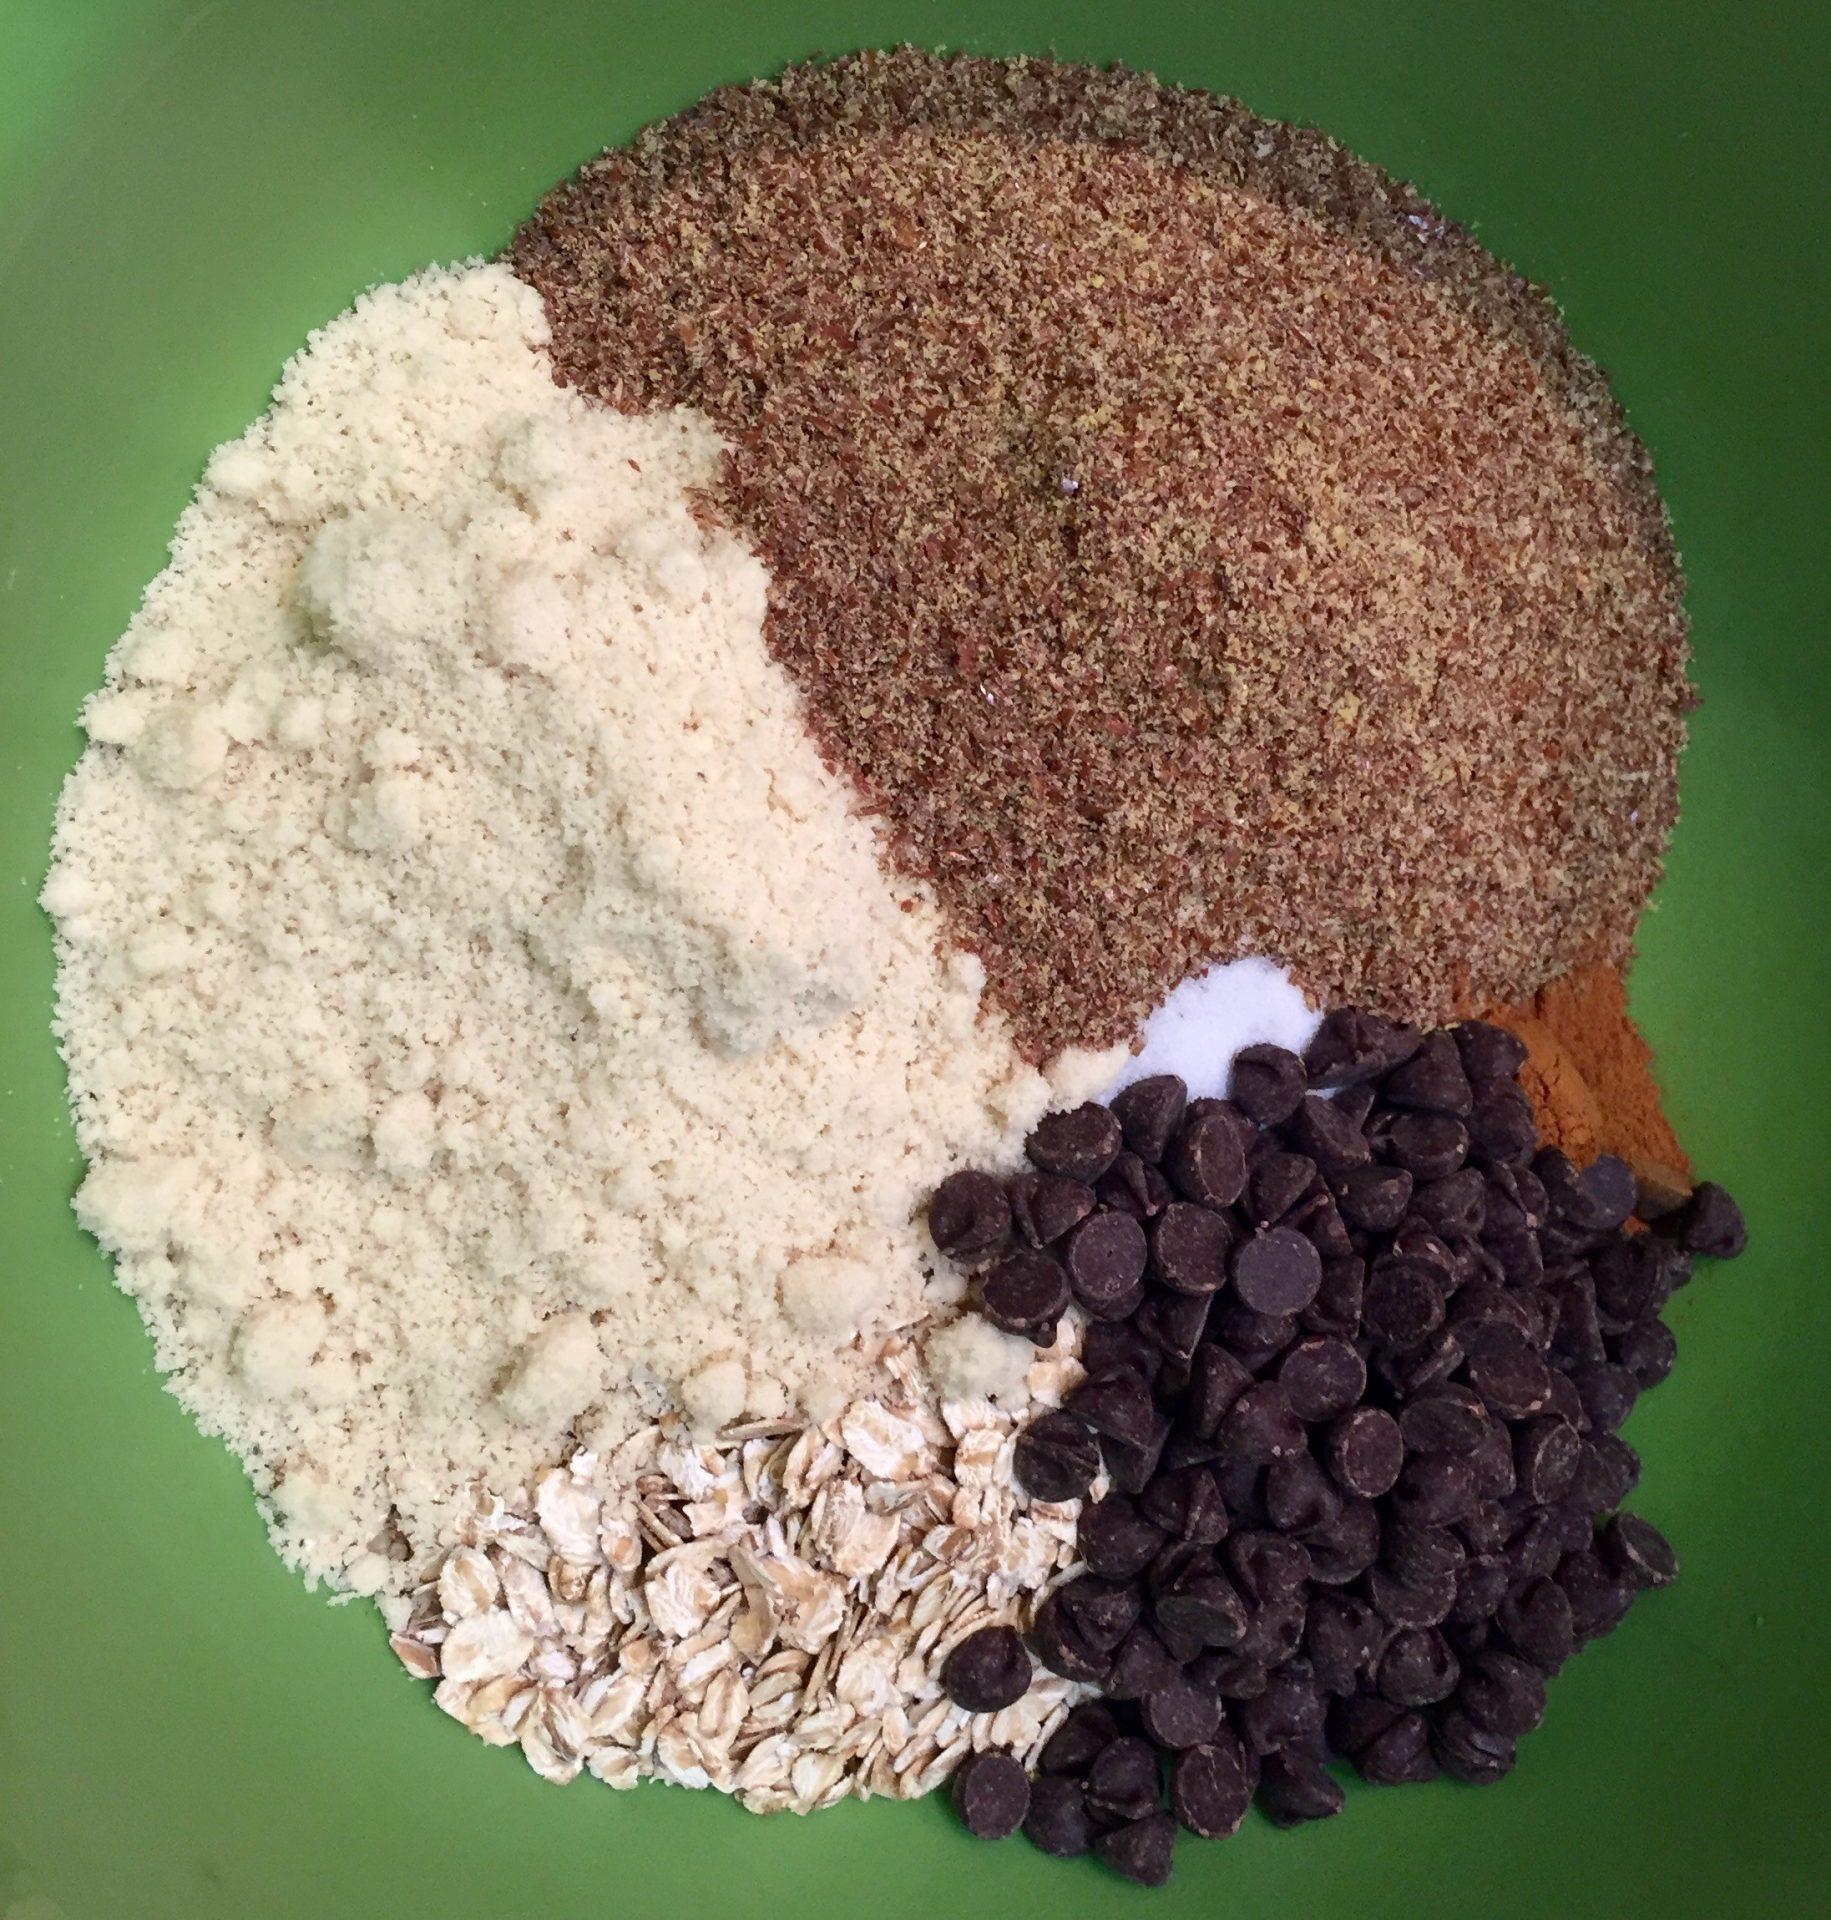 OatmealCookieingredients